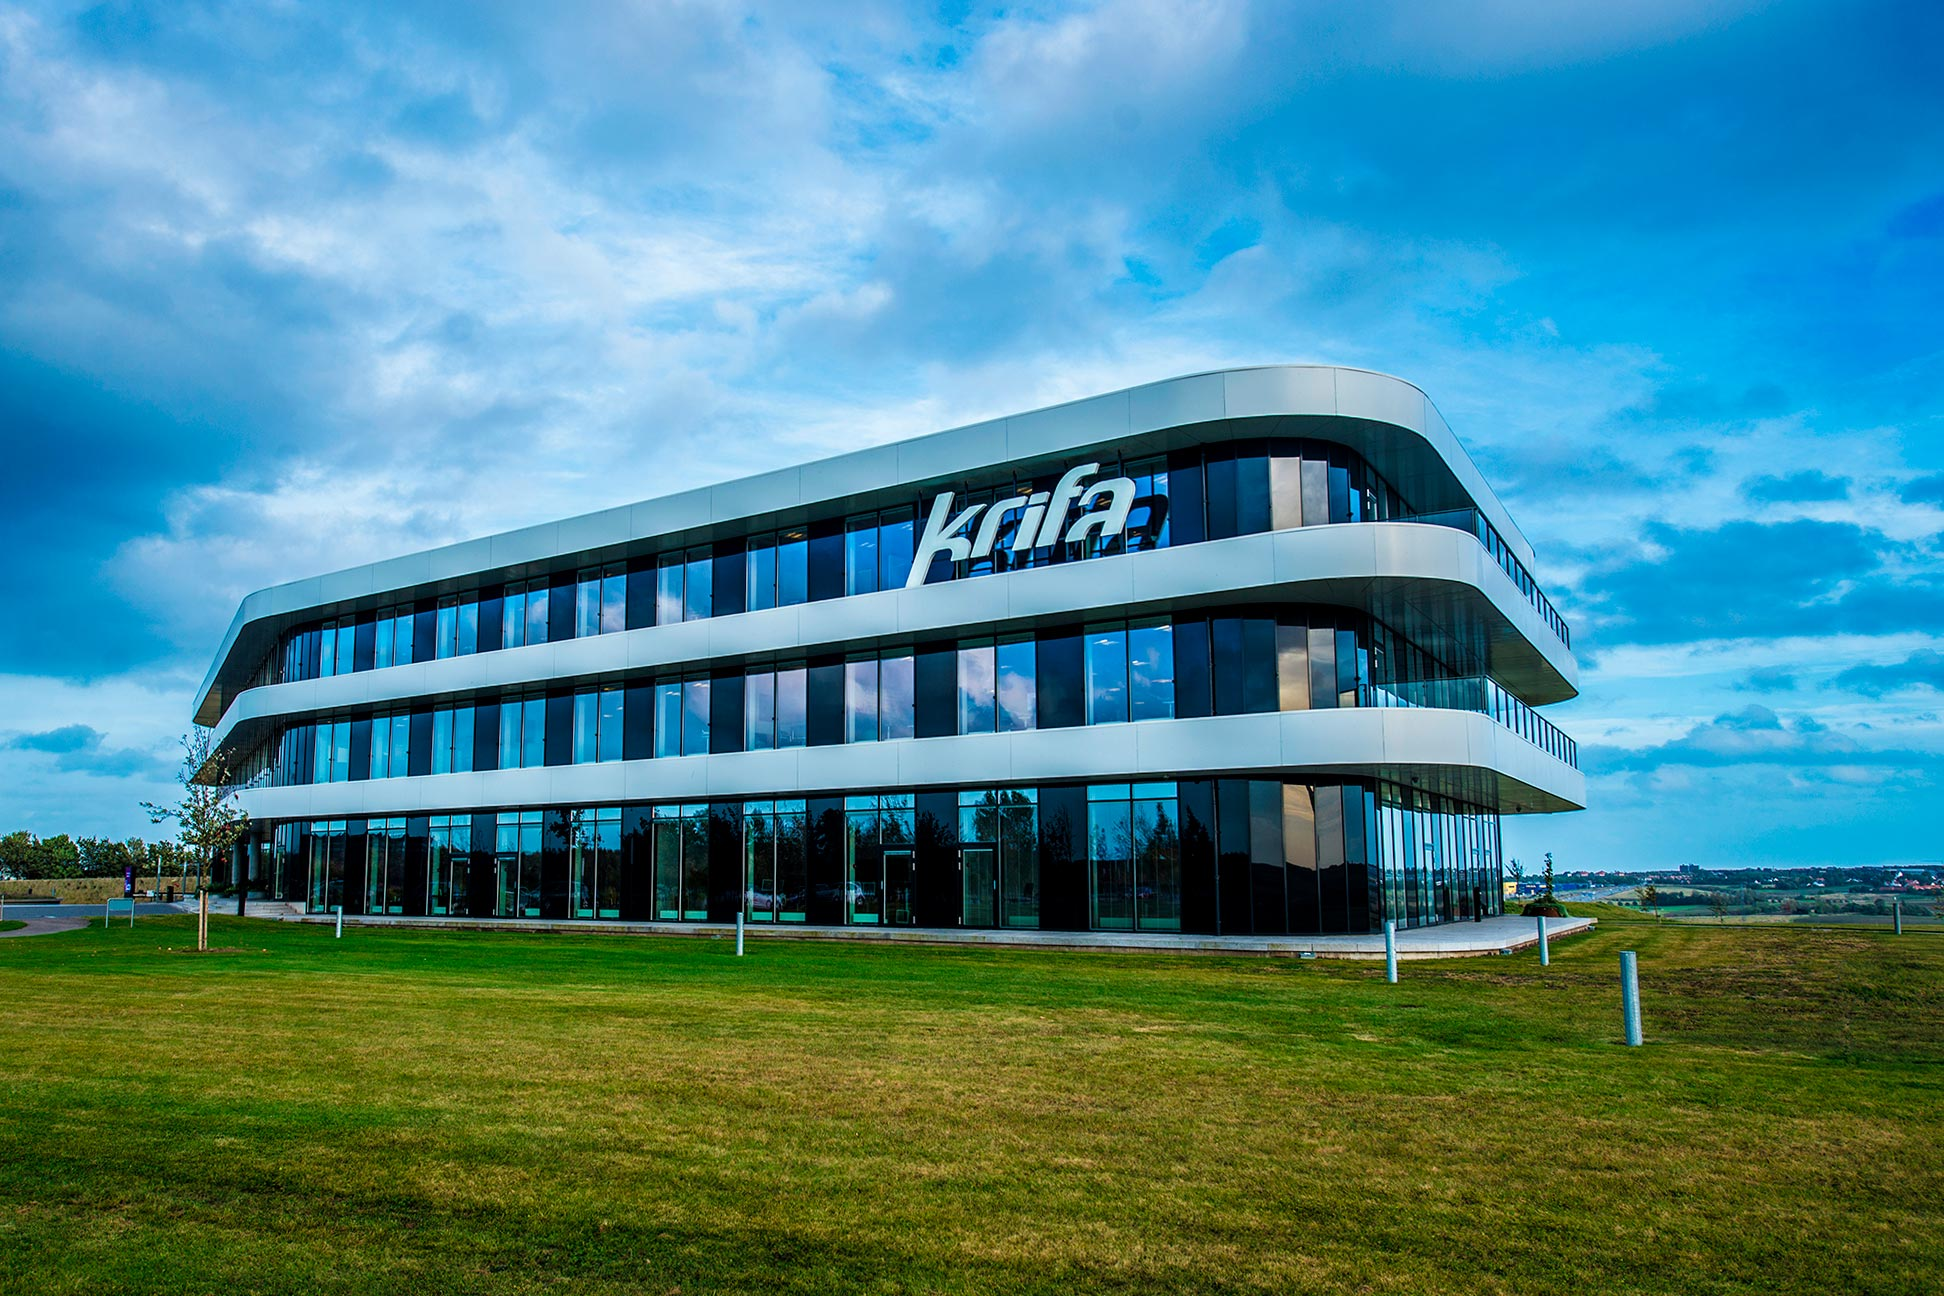 Empresa-Krifa.-Aarhus-Dinamarca.-larson-FR-1_1591091212.jpg